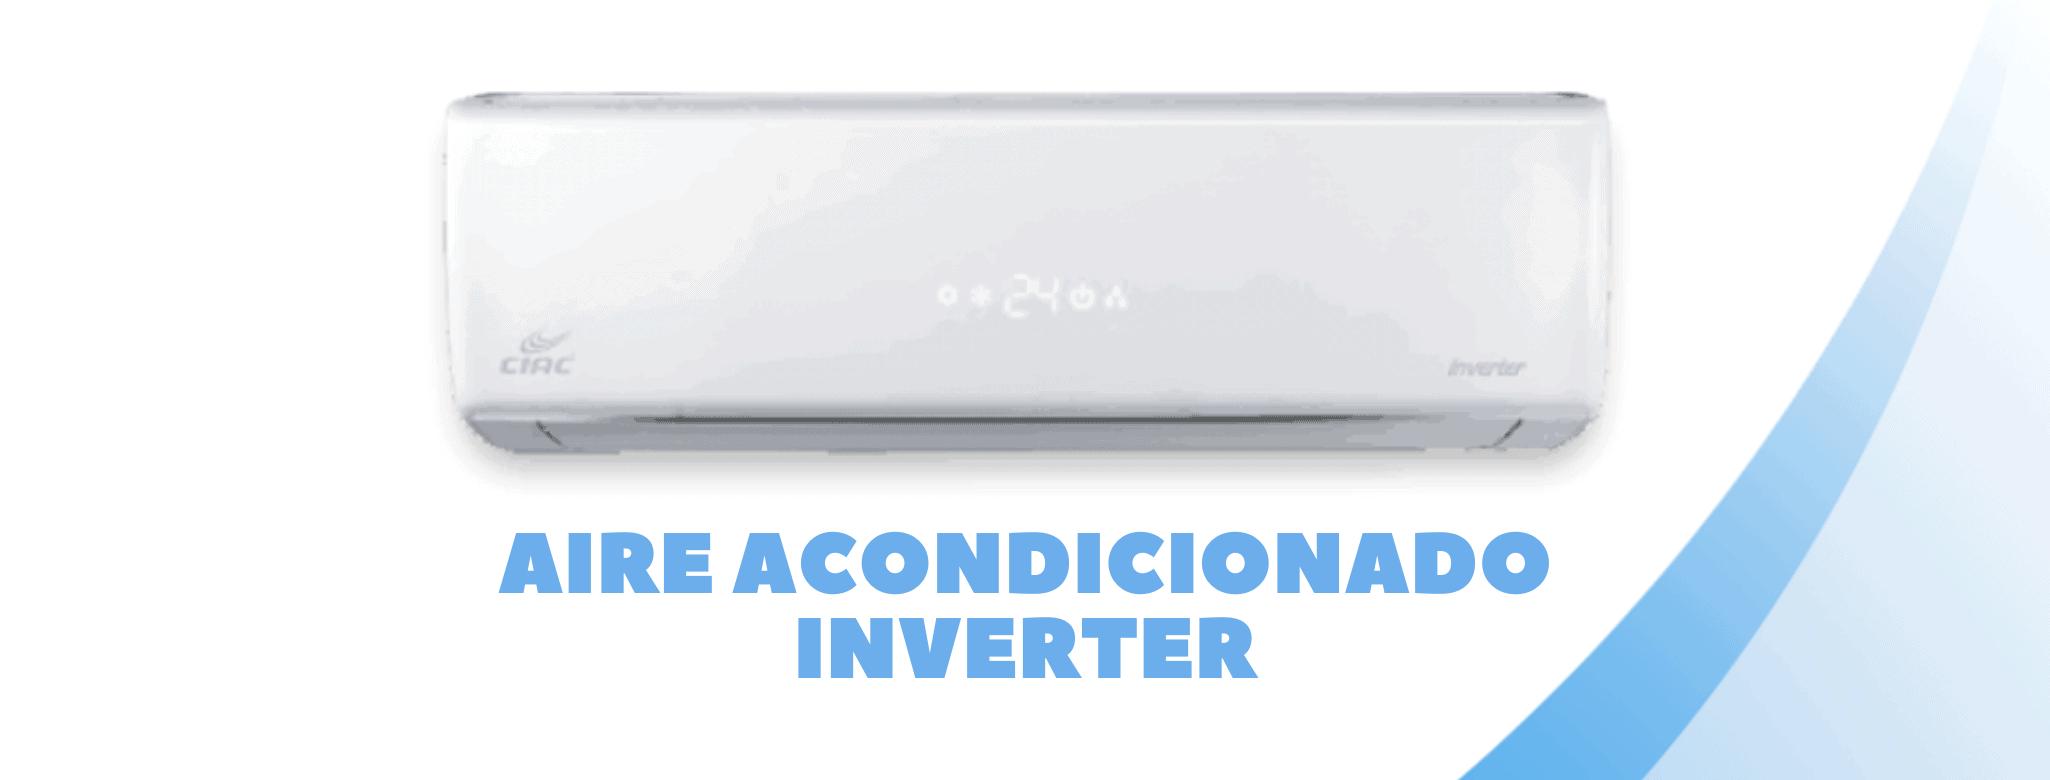 aire_acondicionado_inverter